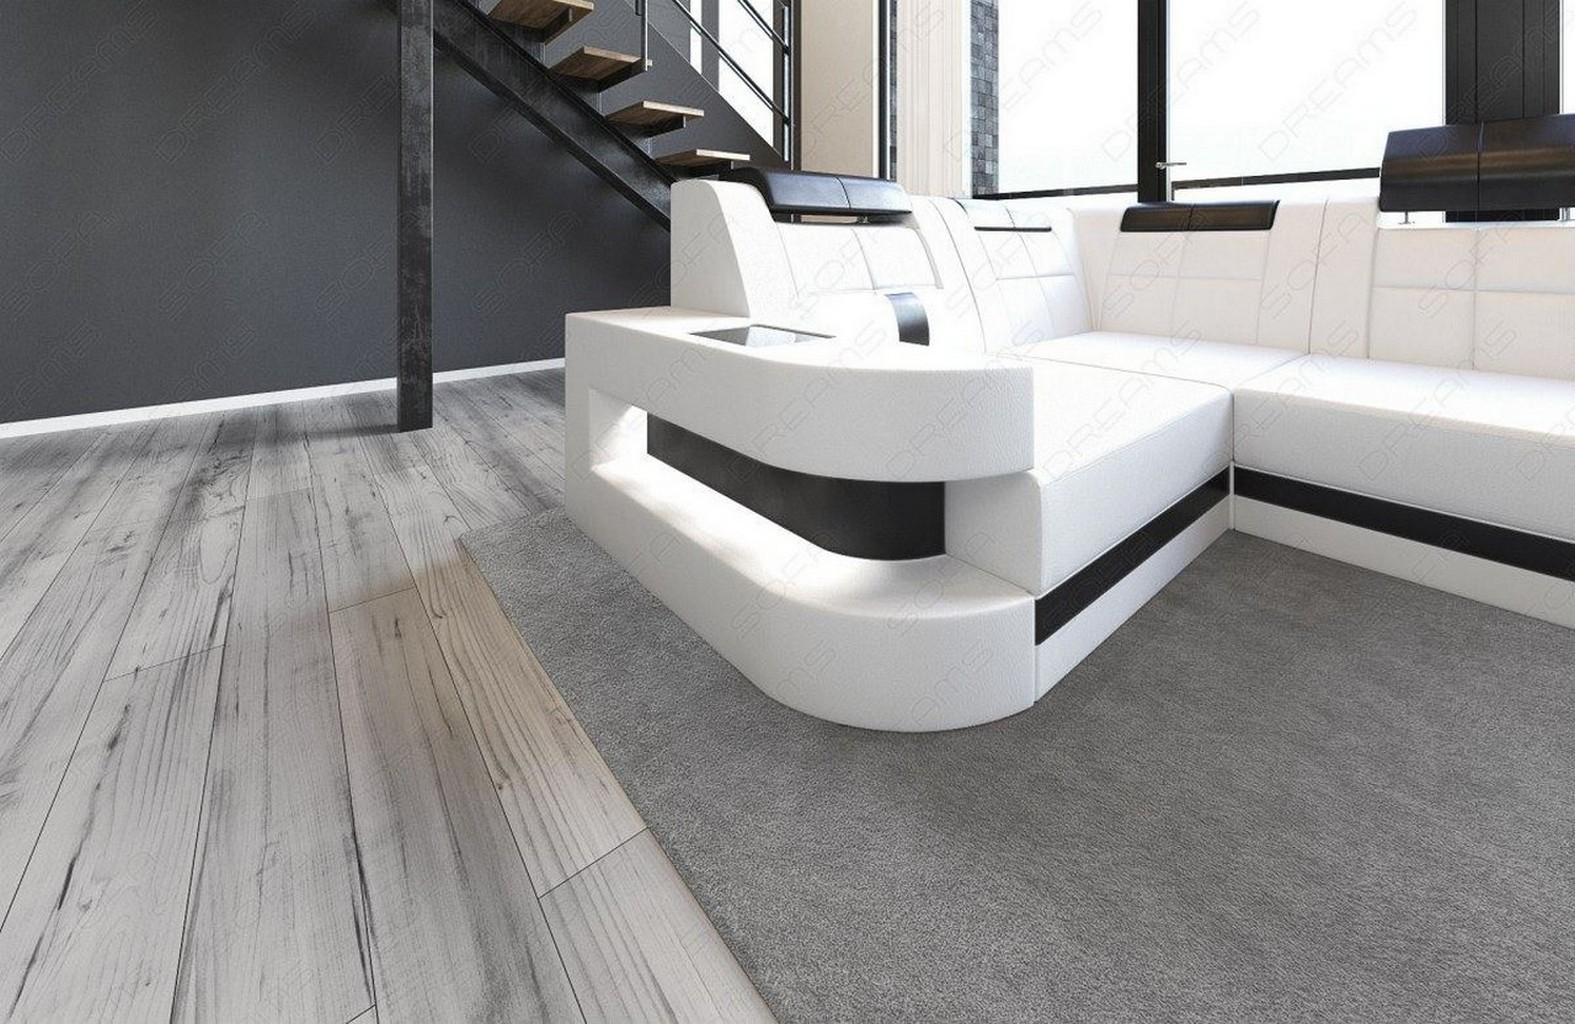 ledersofa wohnlandschaft wave u form led luxus design xxl sofa eckcouch weiss ebay. Black Bedroom Furniture Sets. Home Design Ideas